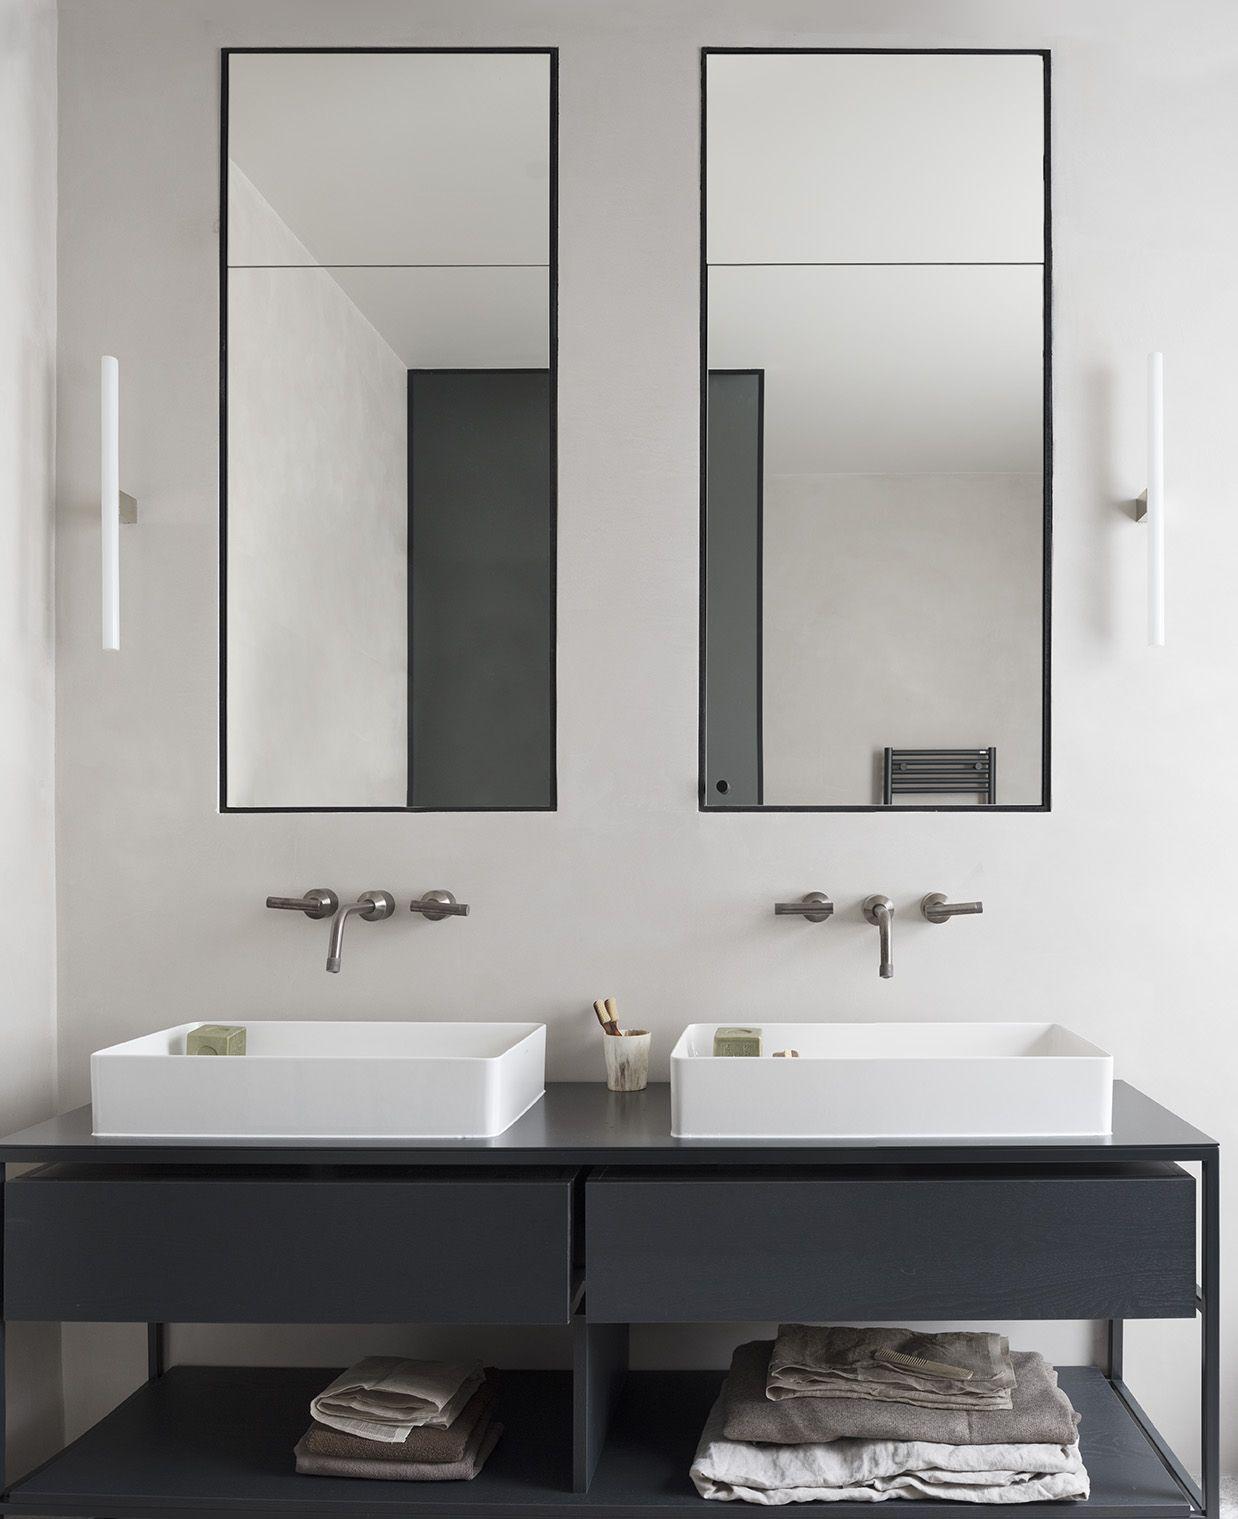 Vanity by MannMade London | Family bathroom | Pinterest | Vanities ...